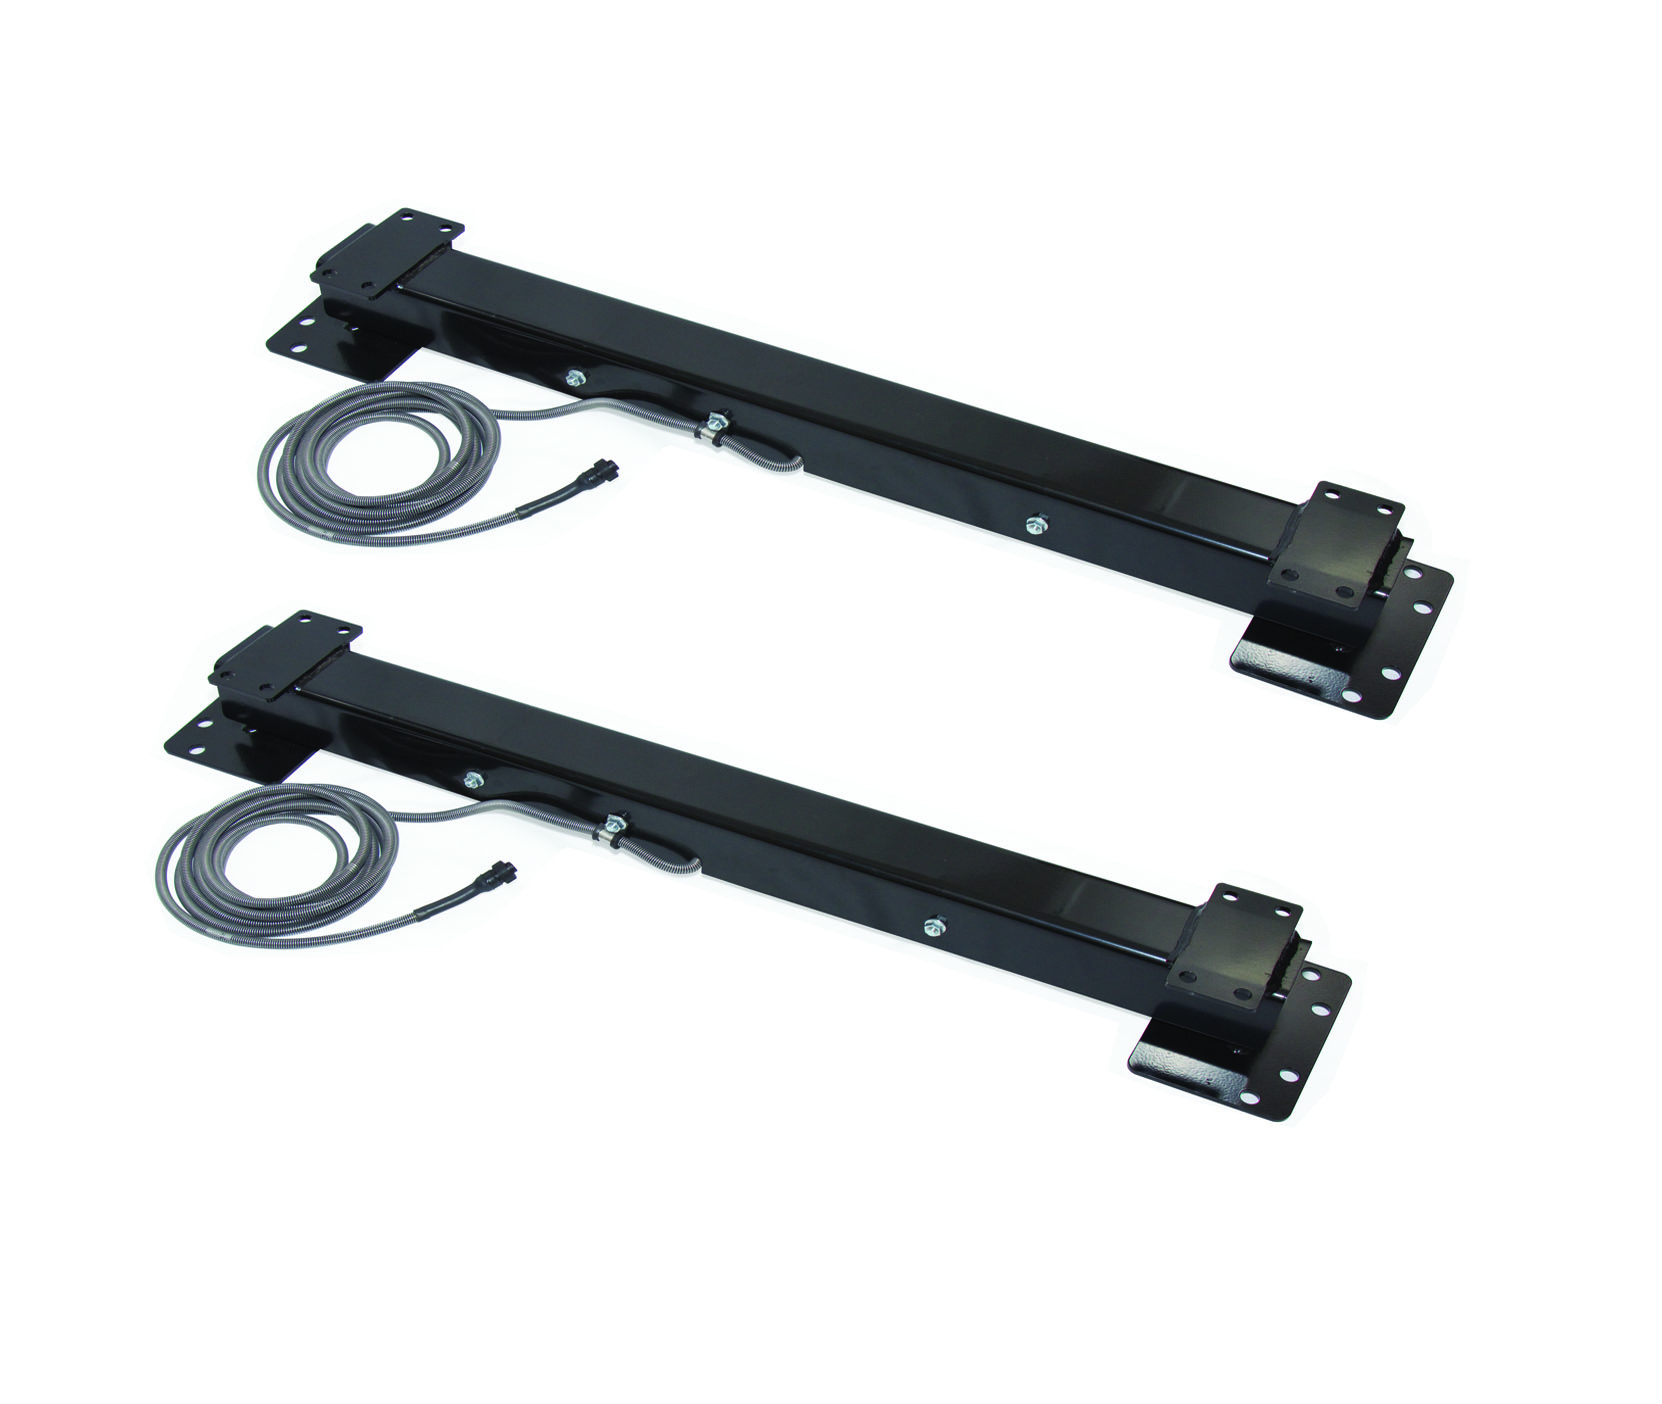 digistar-weigh-beams